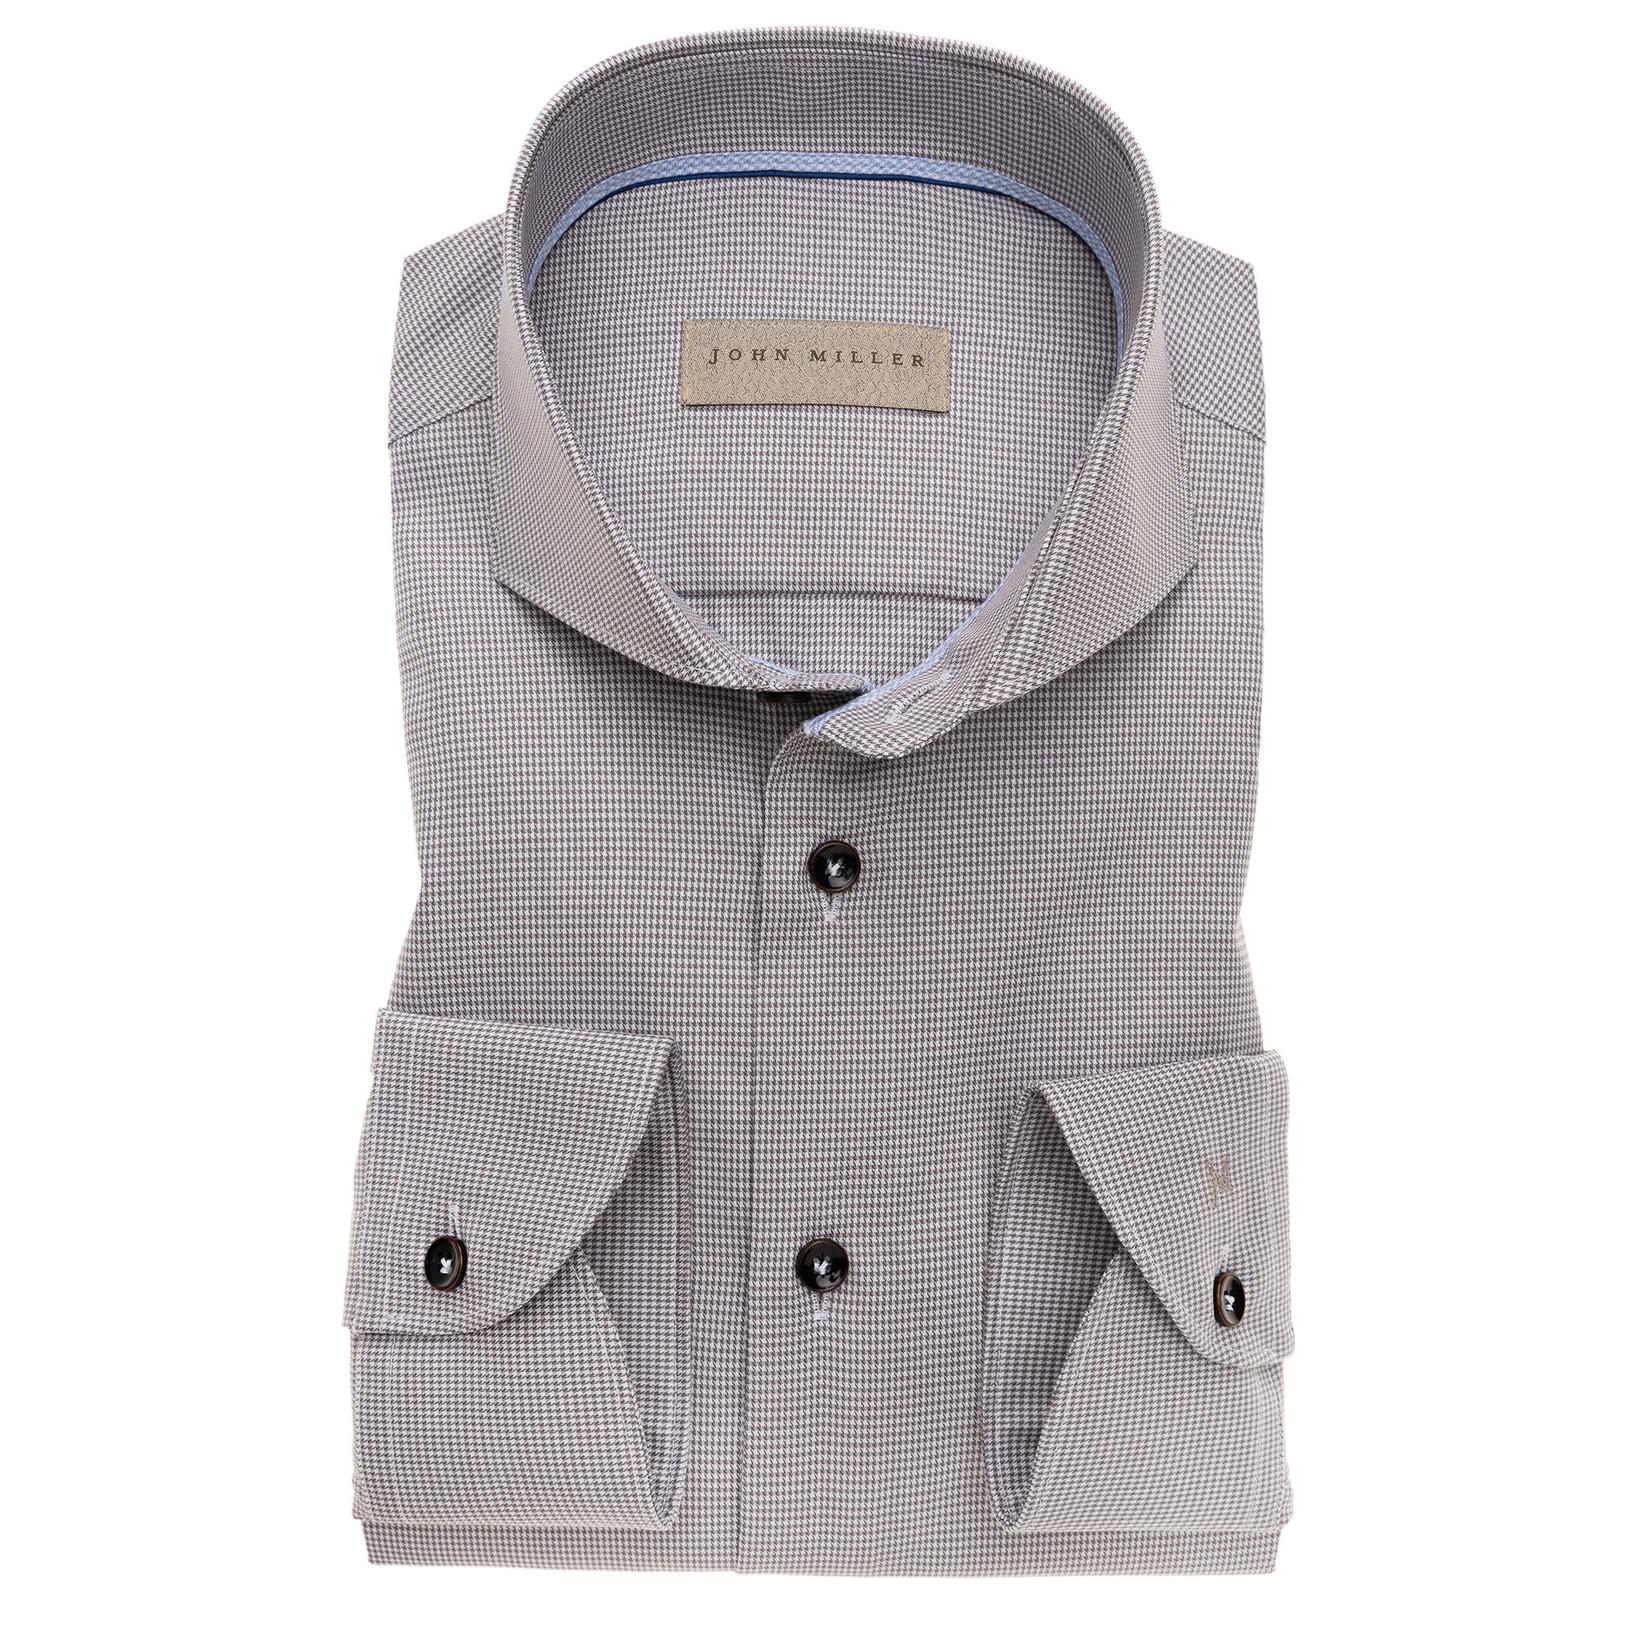 John Miller tailored fit overhemd grijs met cut away boord